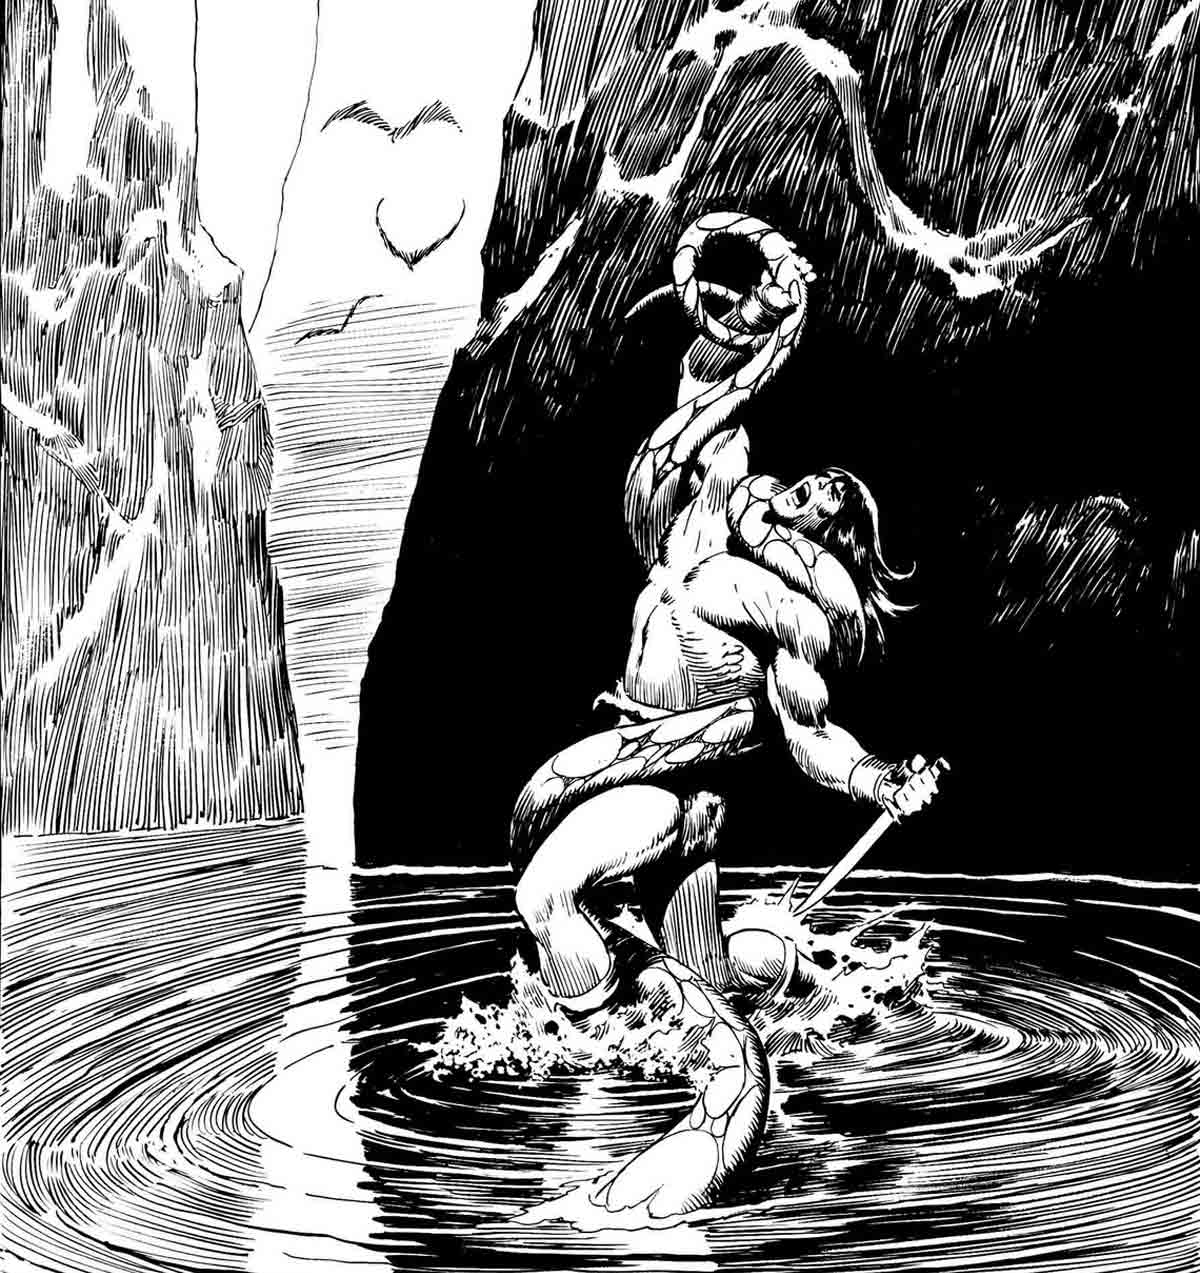 Golem-Comics-La-espada-salvaje-de-conan-el-barbaro-la-llegada-de-conan-05